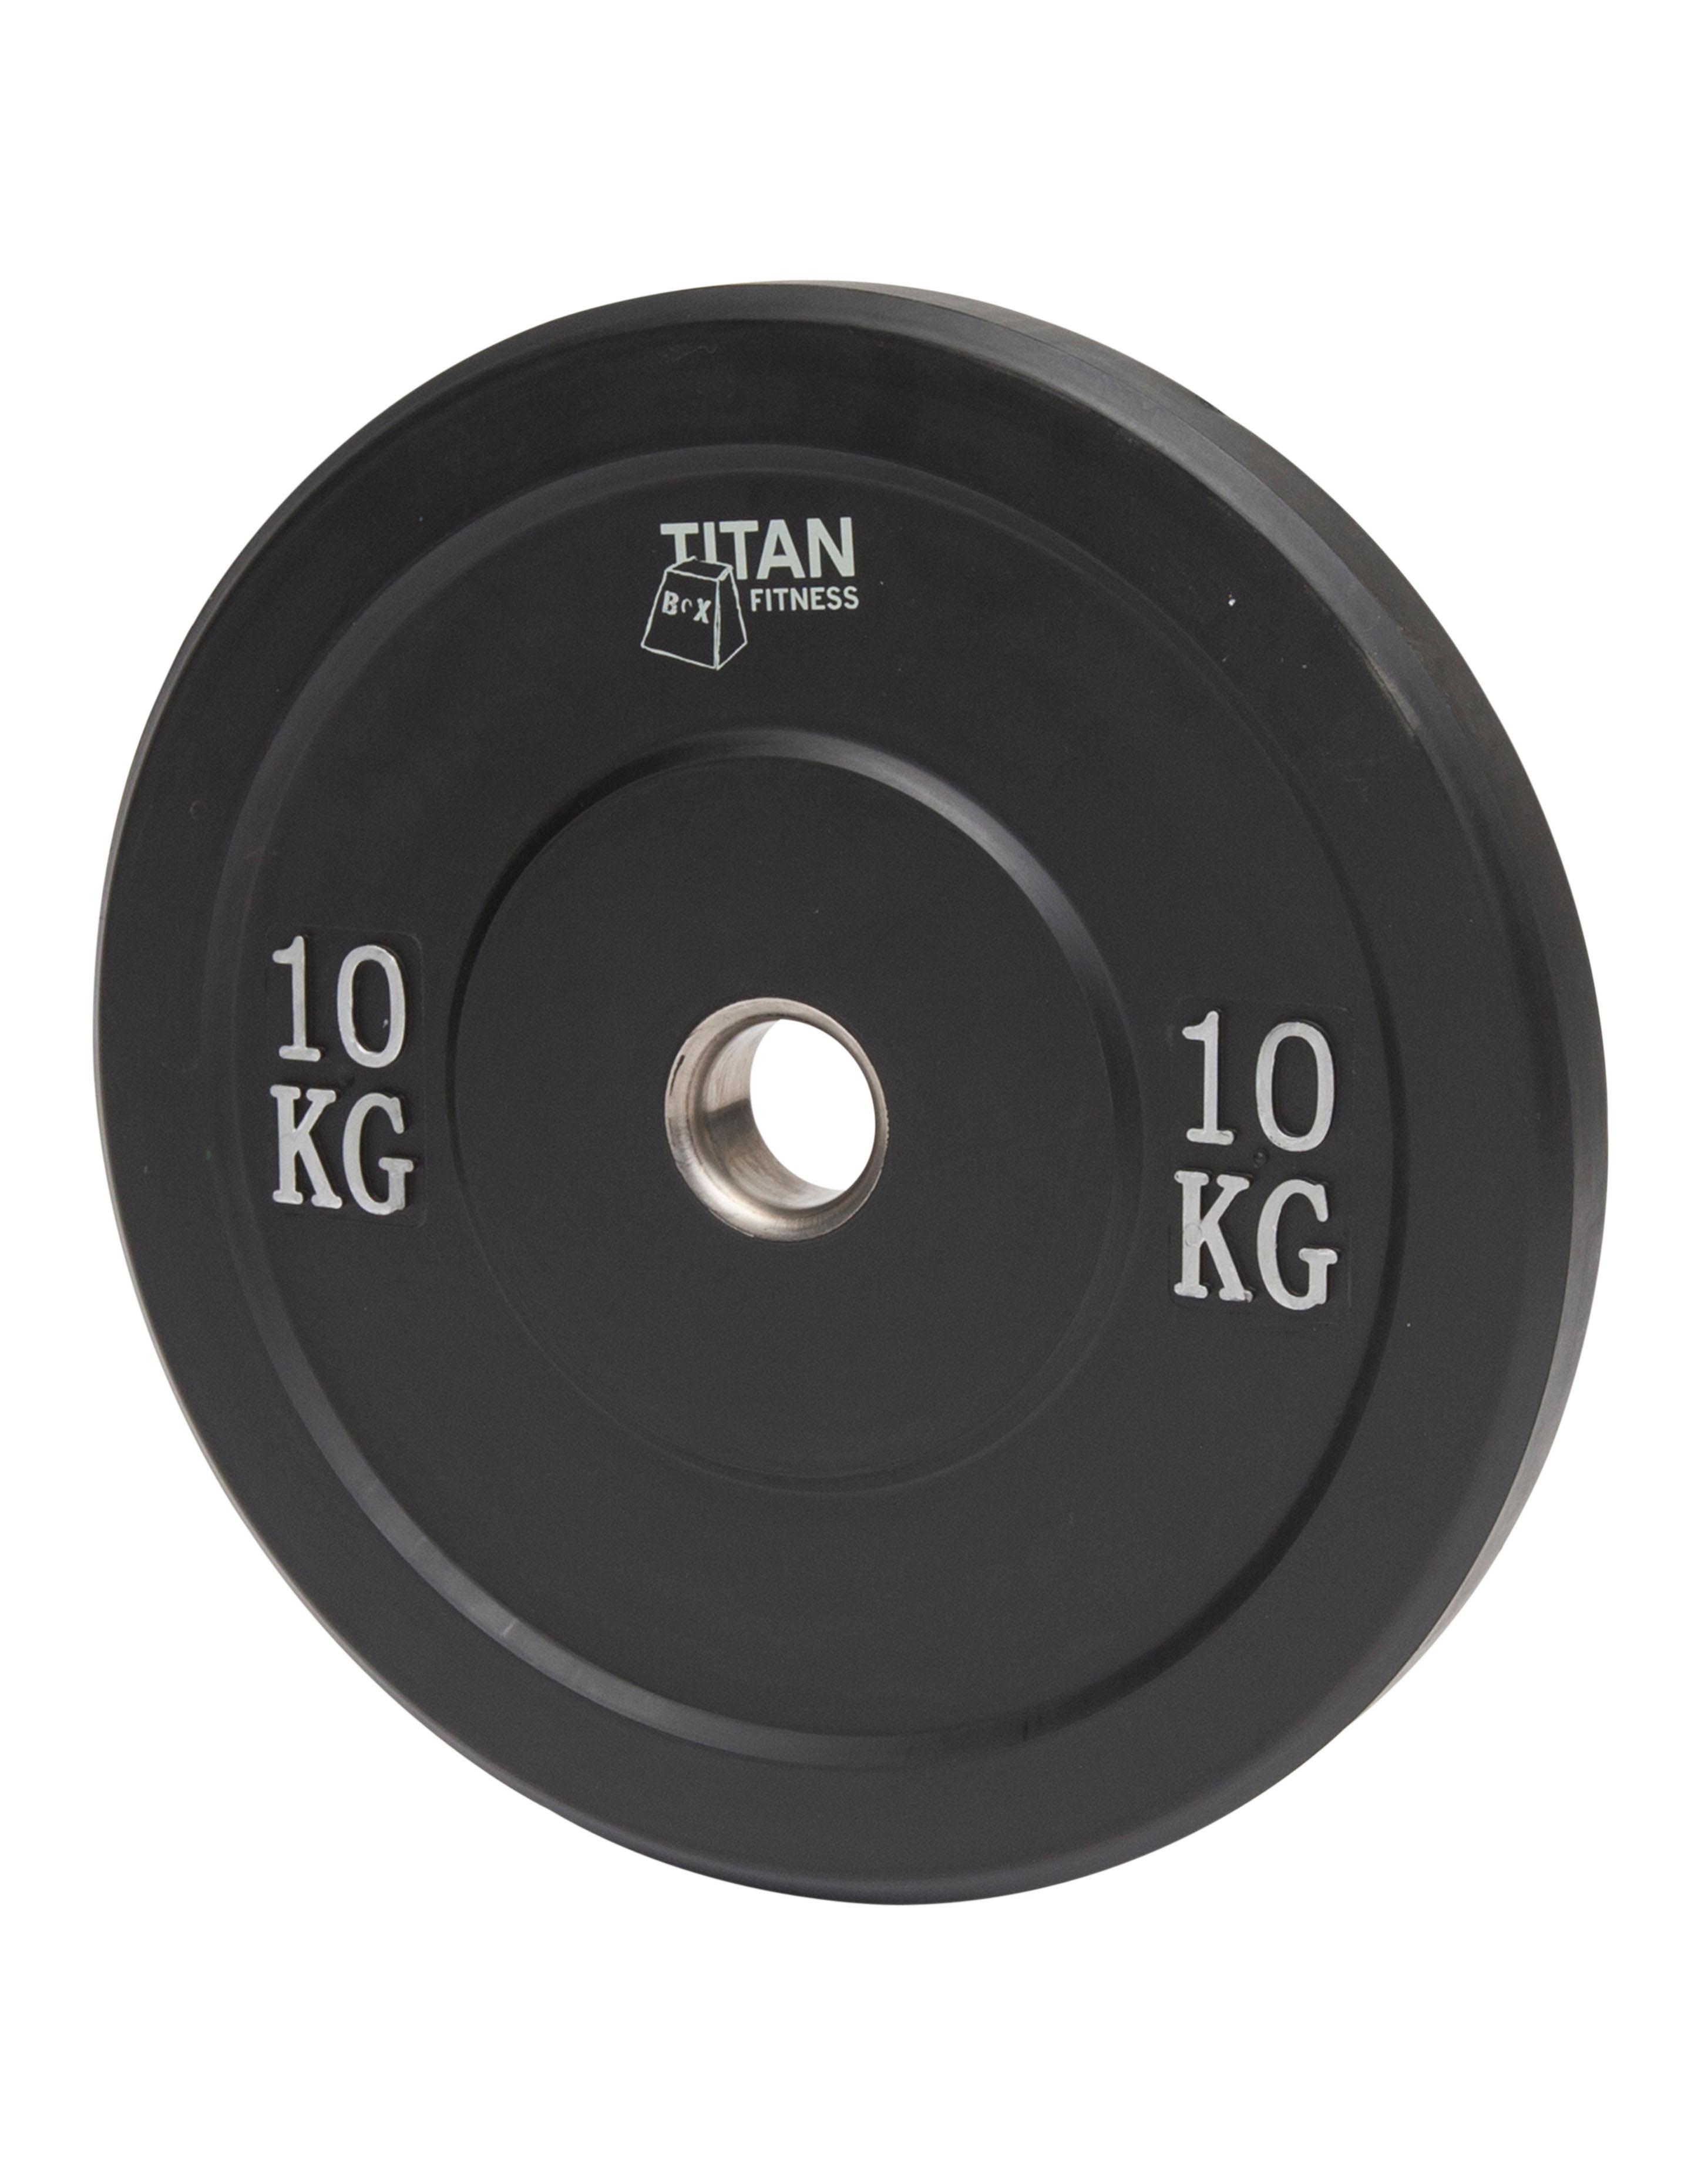 Titan BOX Bumper plates 10 kg Black